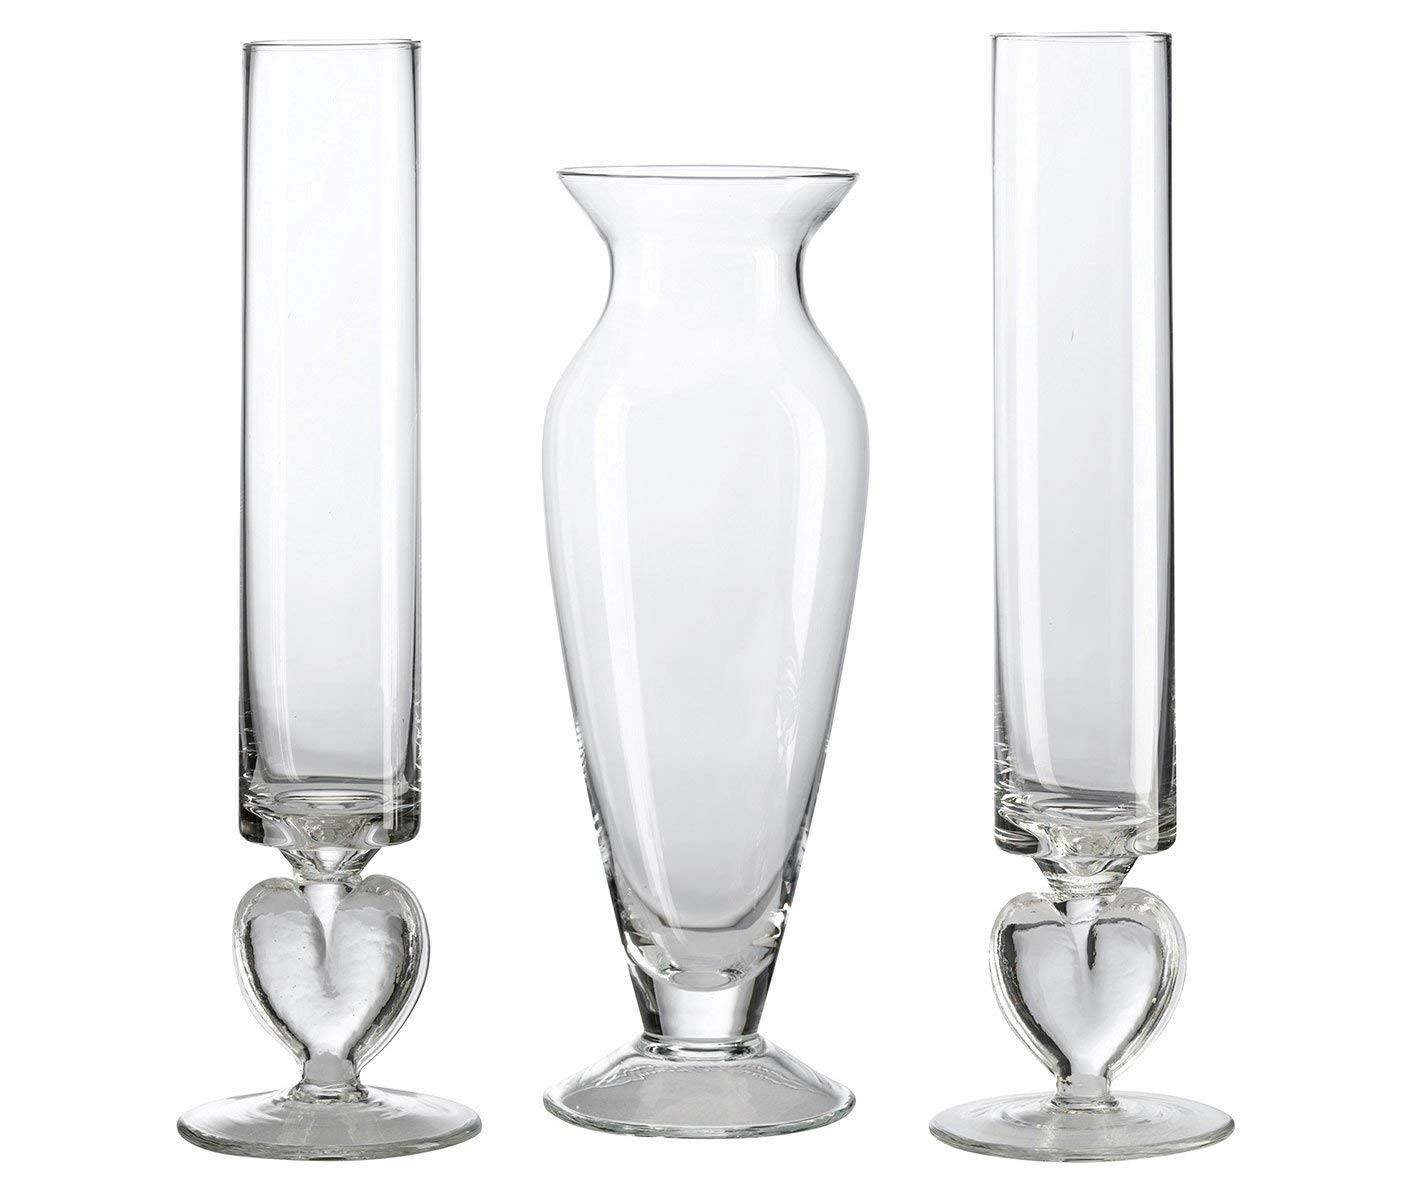 9 inch cylinder vase of amazon com lillian rose unity sand ceremony wedding vase set home with amazon com lillian rose unity sand ceremony wedding vase set home kitchen